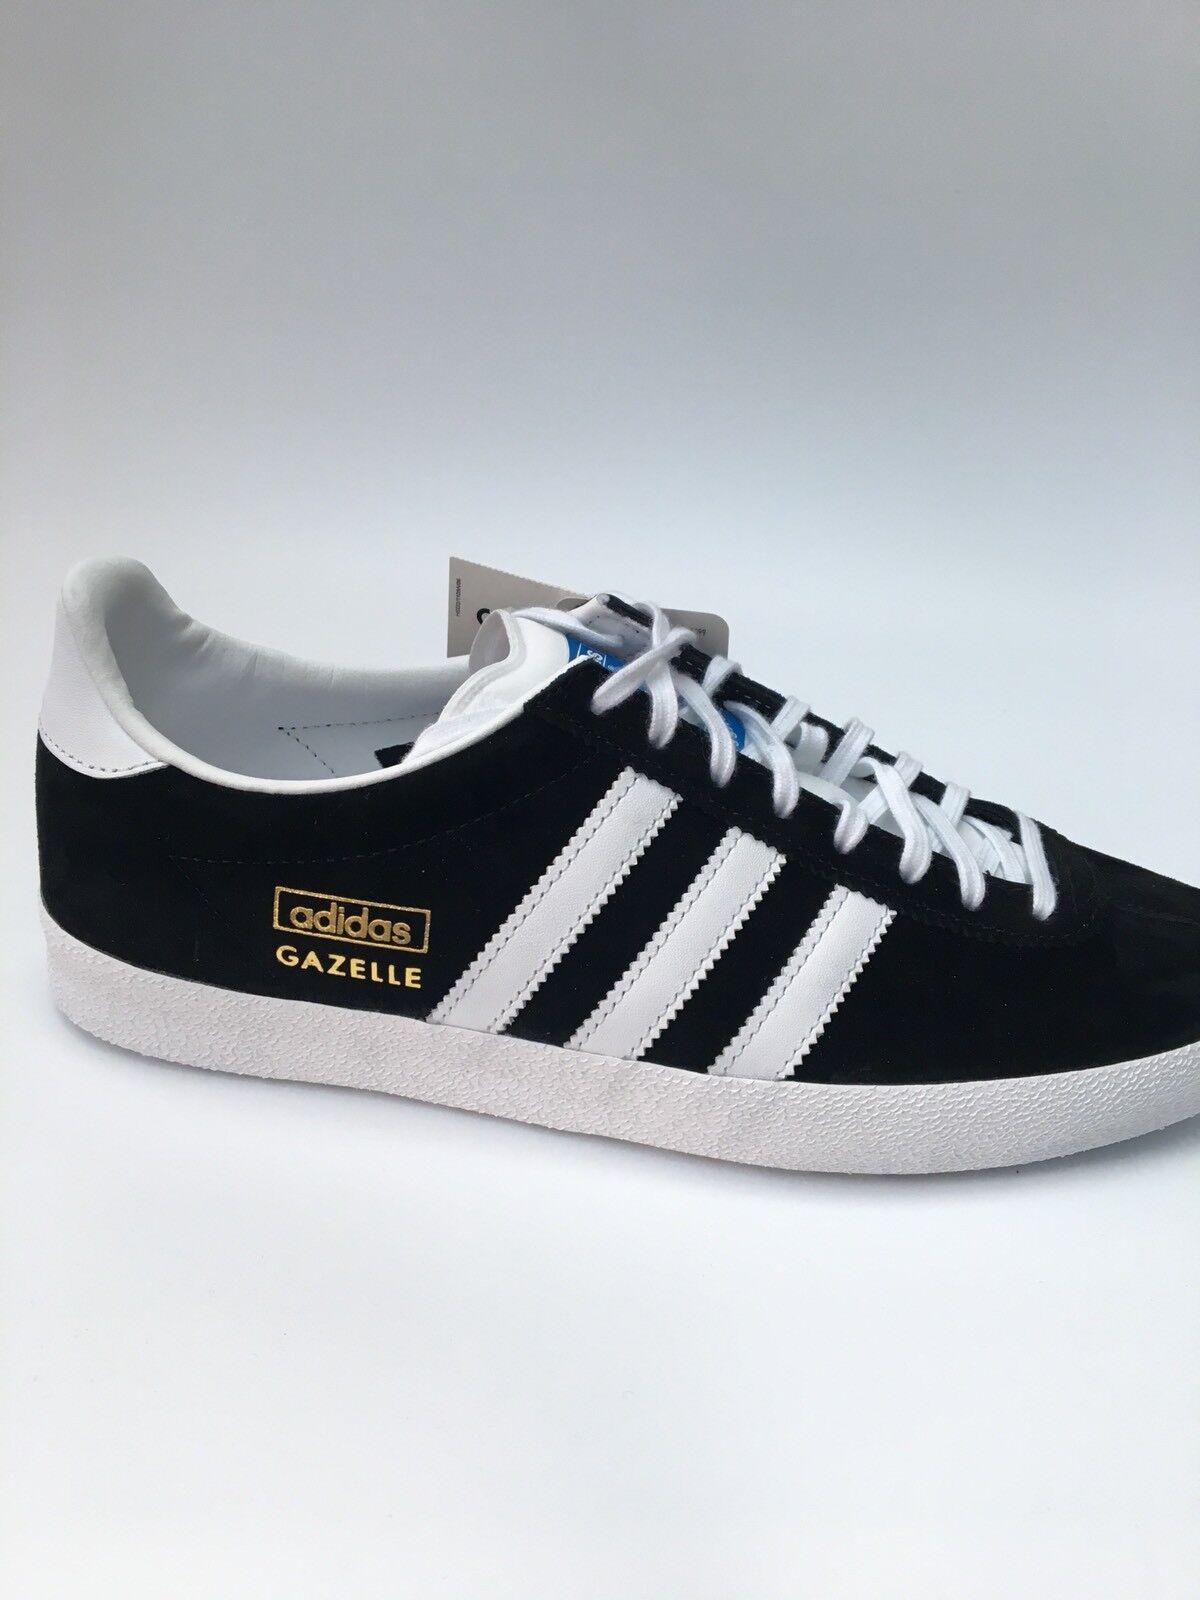 adidas original Gazelle OG Trainers Negro Brand New In Box G13265 - G13265 Box All Talla b19aa7